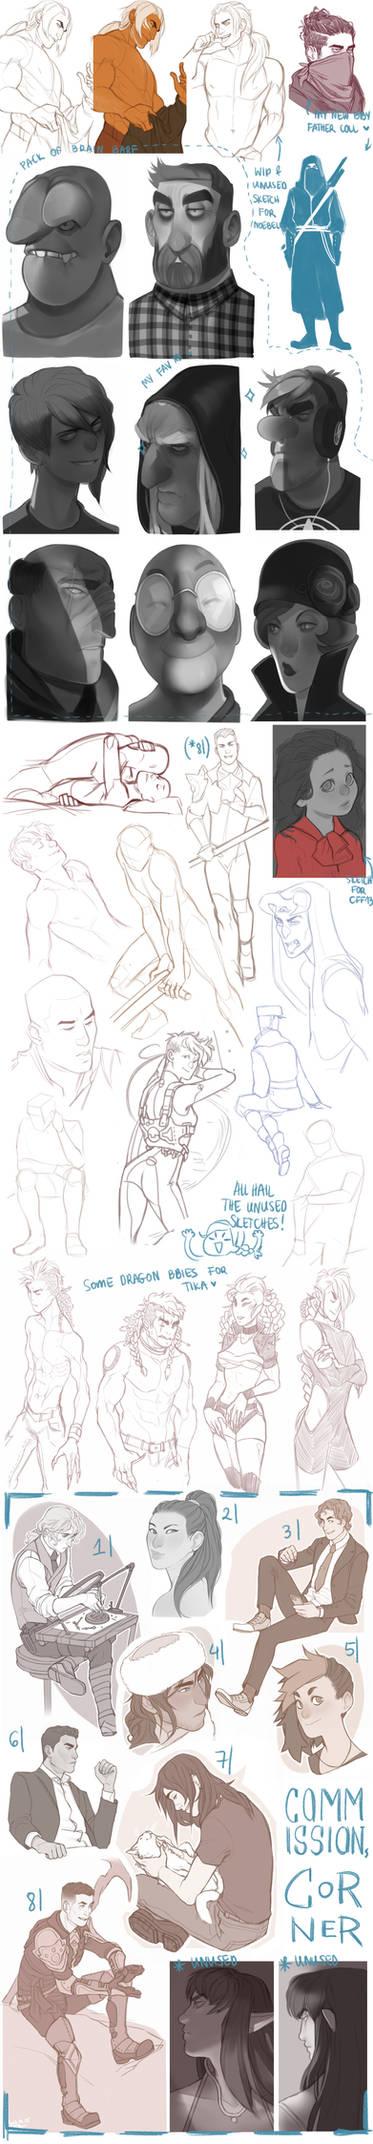 Sketch Dump 13